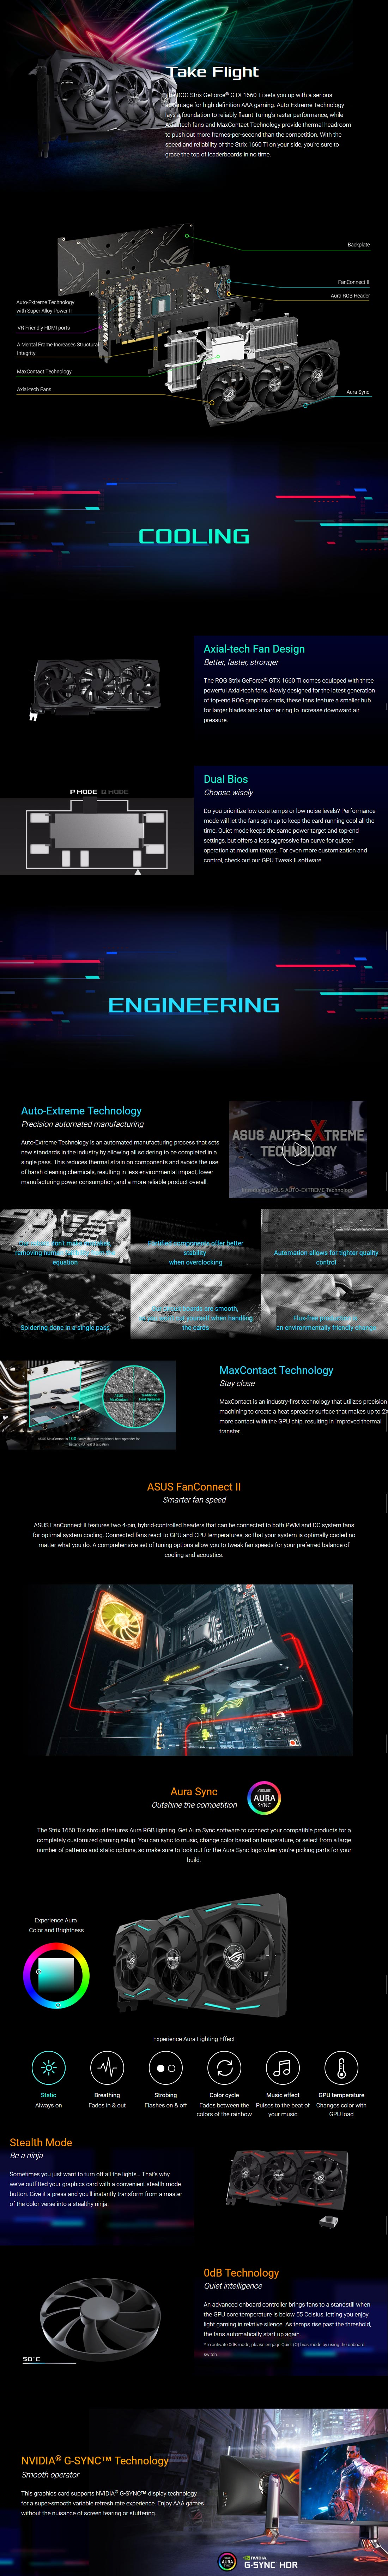 Buy Asus GTX 1660TI 6G STRIX ROG OC Online, Australia - Evatech